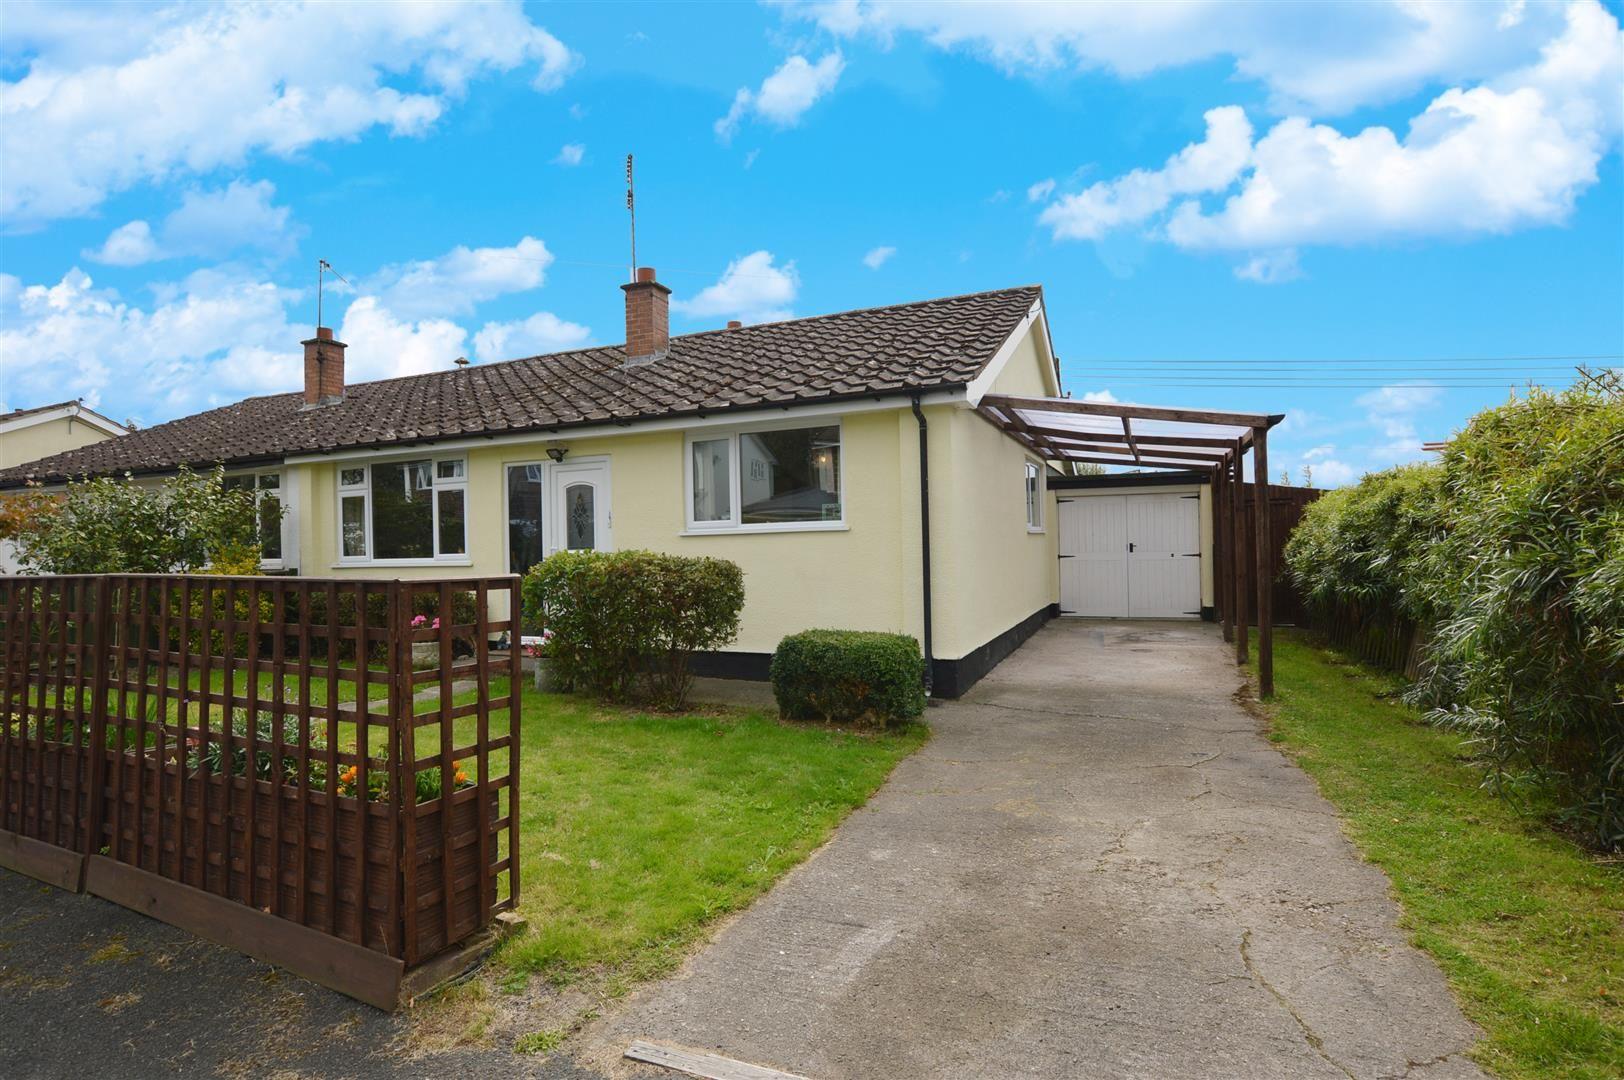 3 bed semi-detached-bungalow for sale in Shobdon, HR6